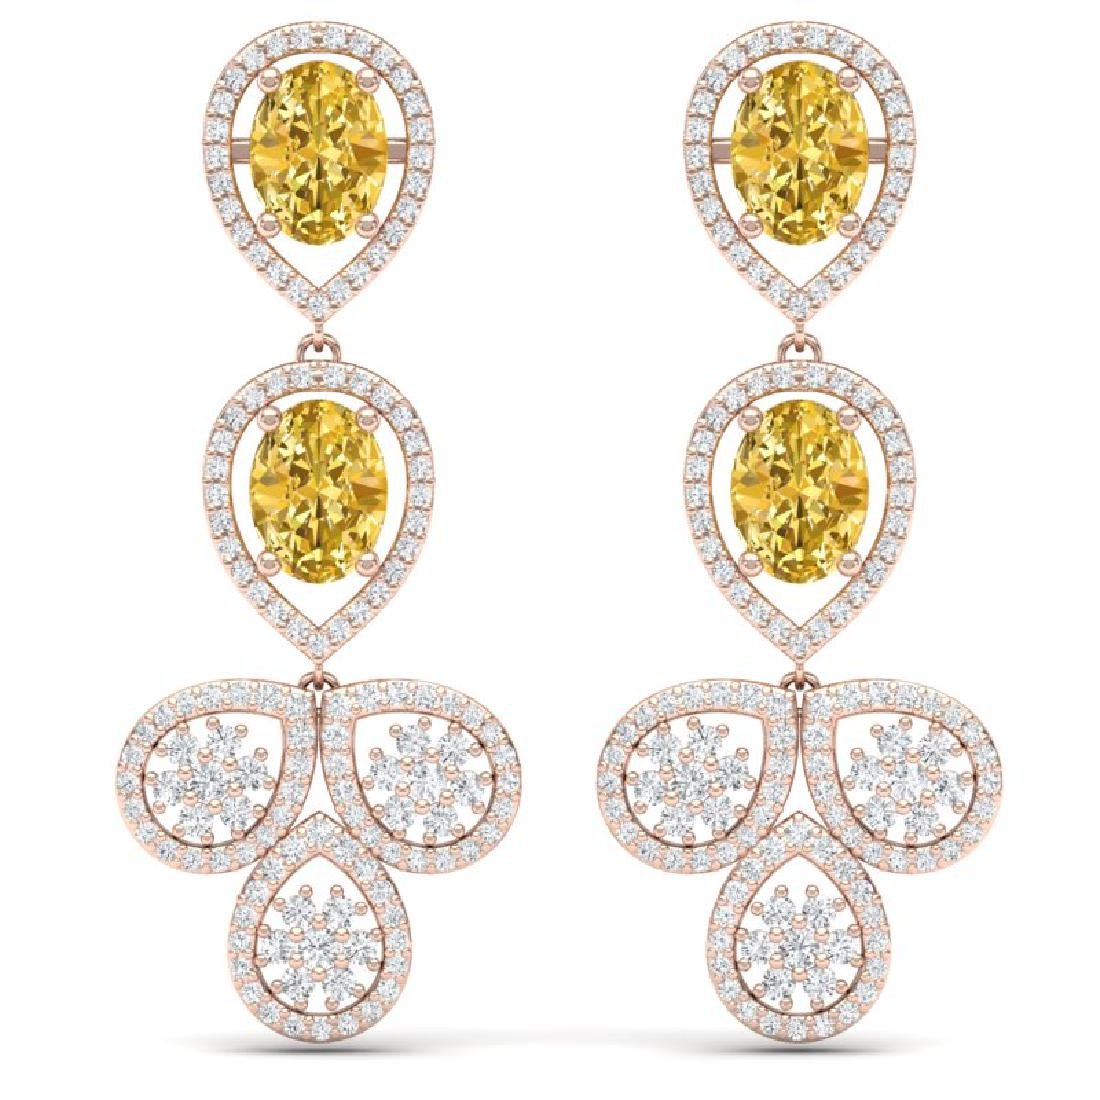 8.15 CTW Royalty Canary Citrine & VS Diamond Earrings